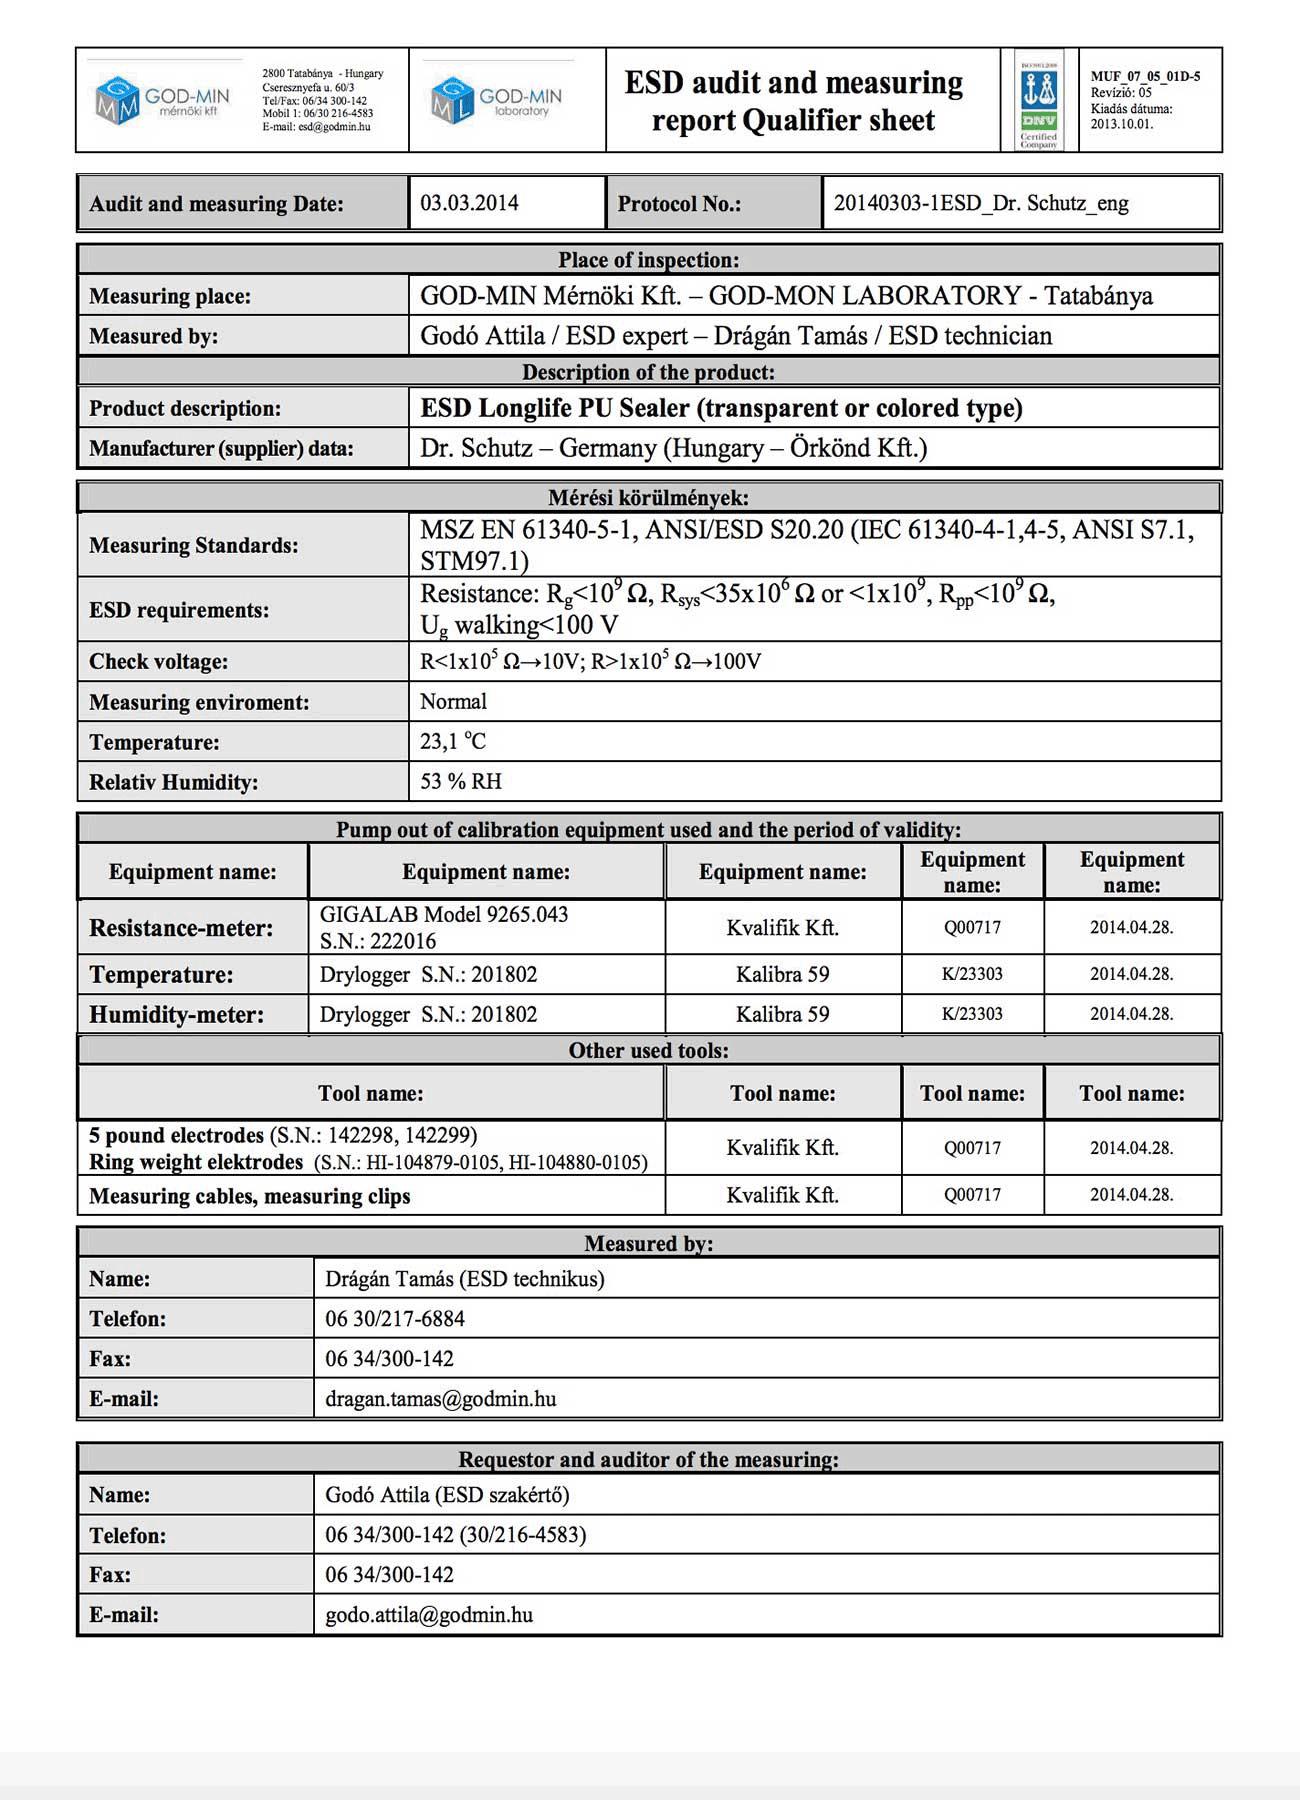 Measurement report for ESD Transparent/Color PU System